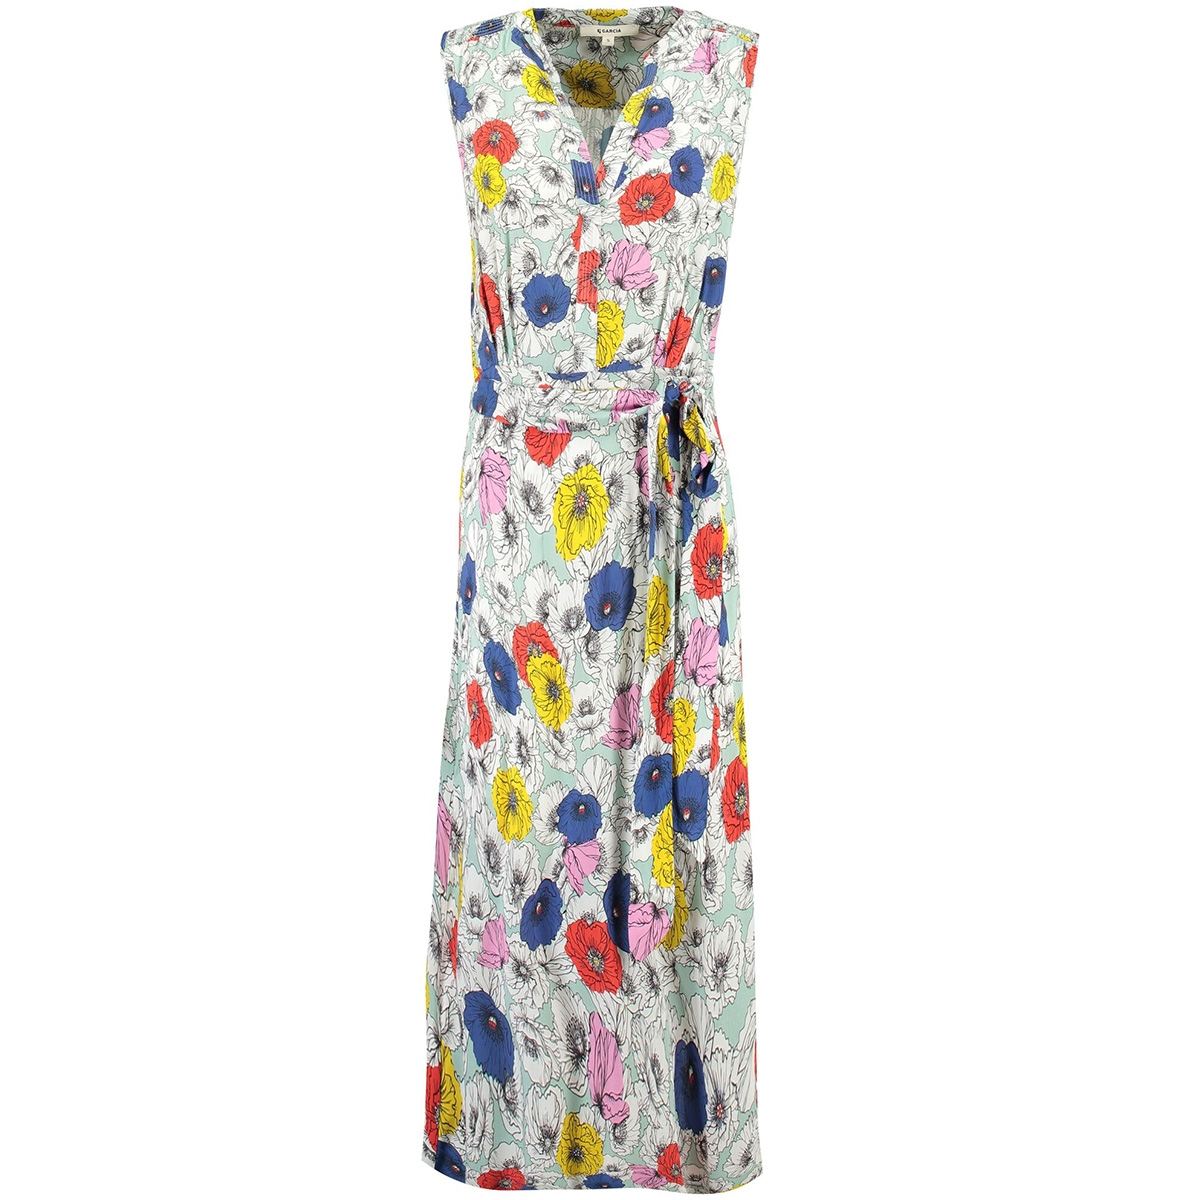 groene jurk met print e90080 garcia jurk 2715 perfect mint